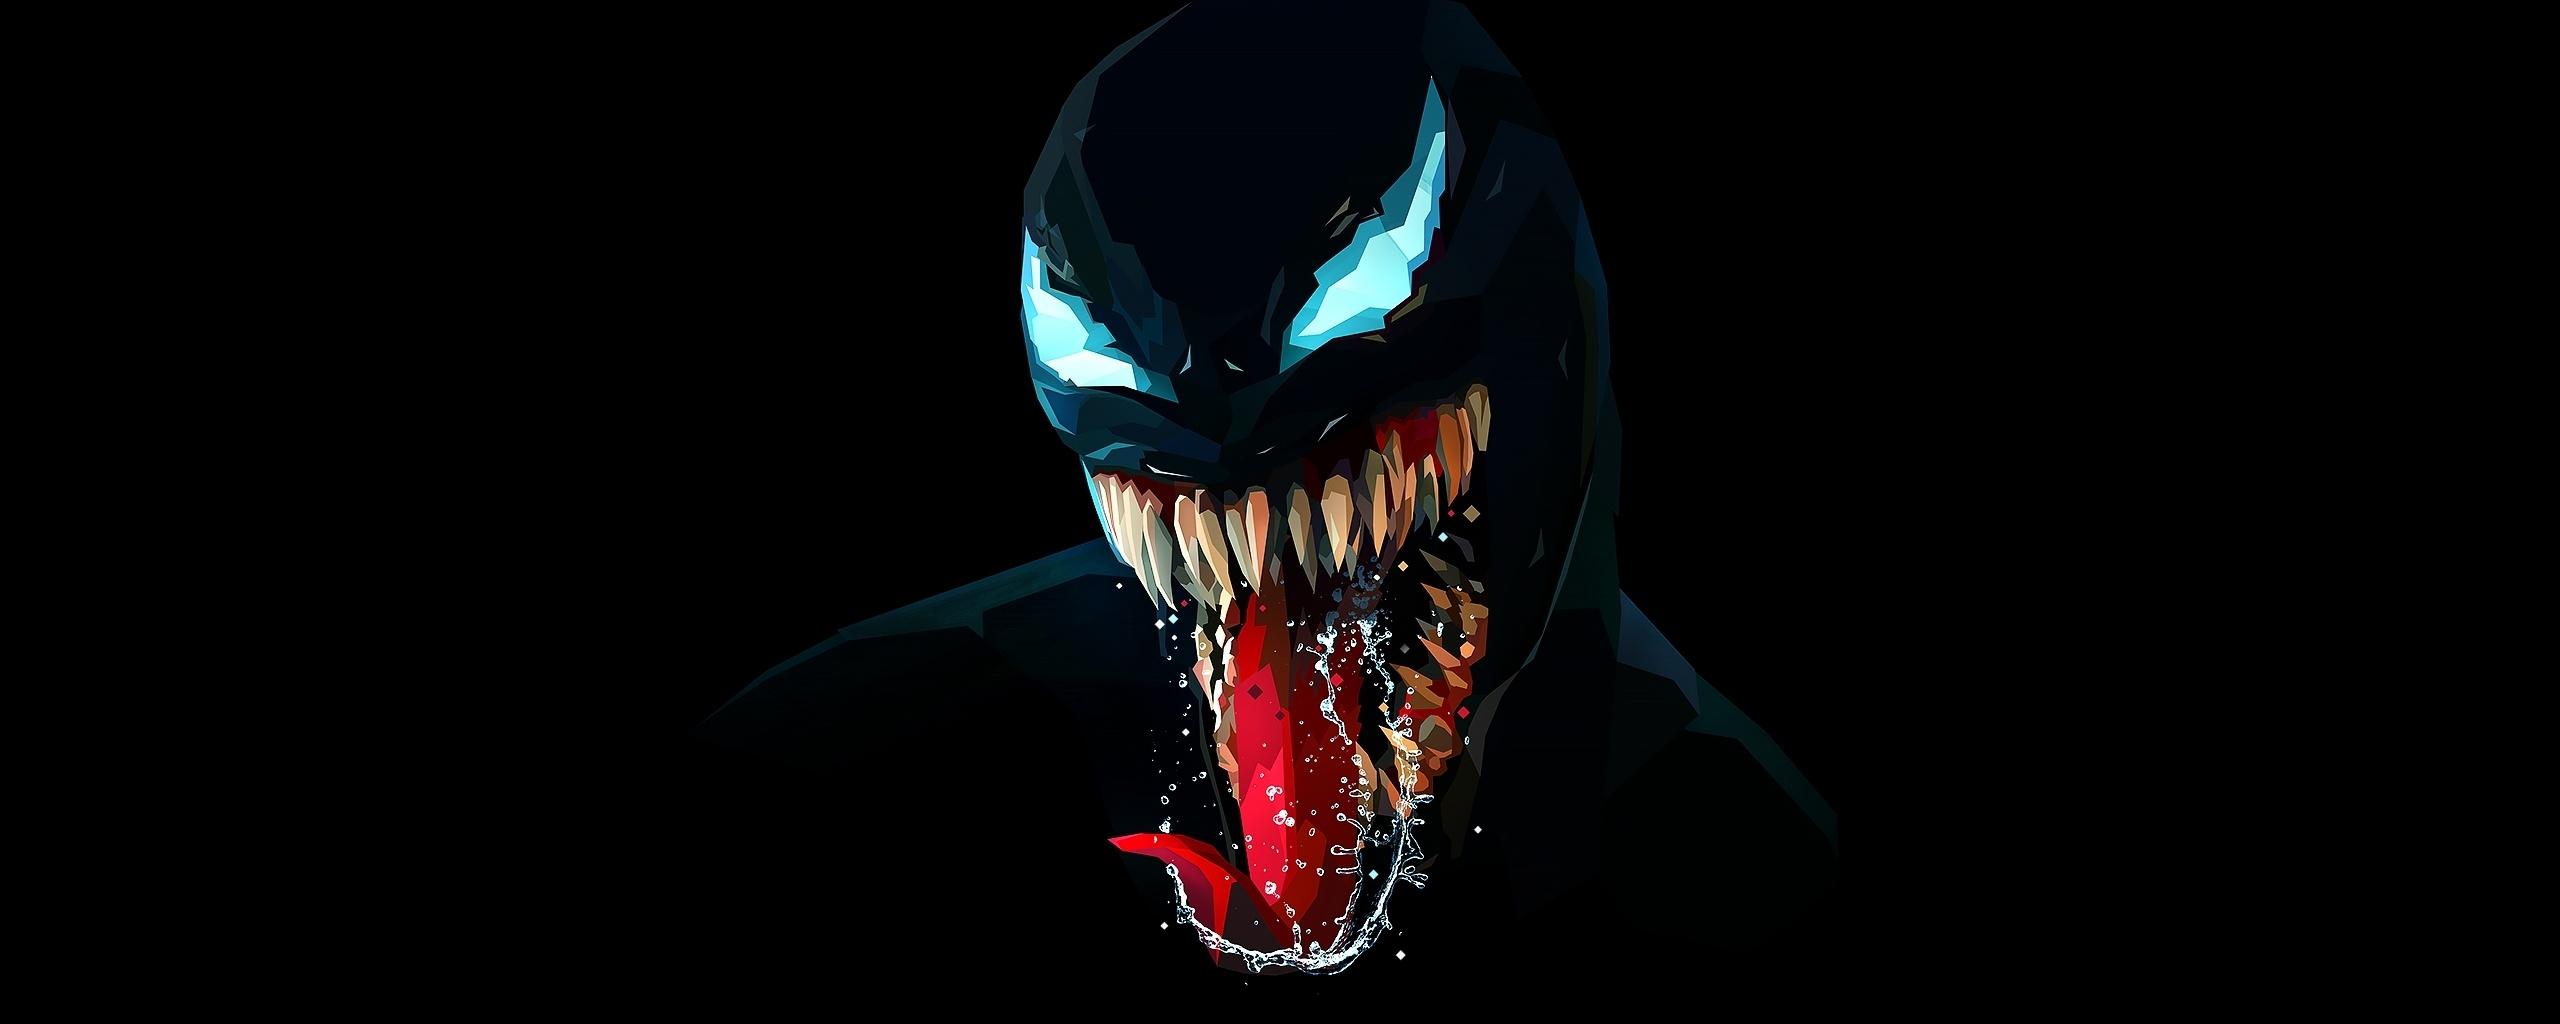 Venom, artwork, minimal, dark, 2560x1024 wallpaper